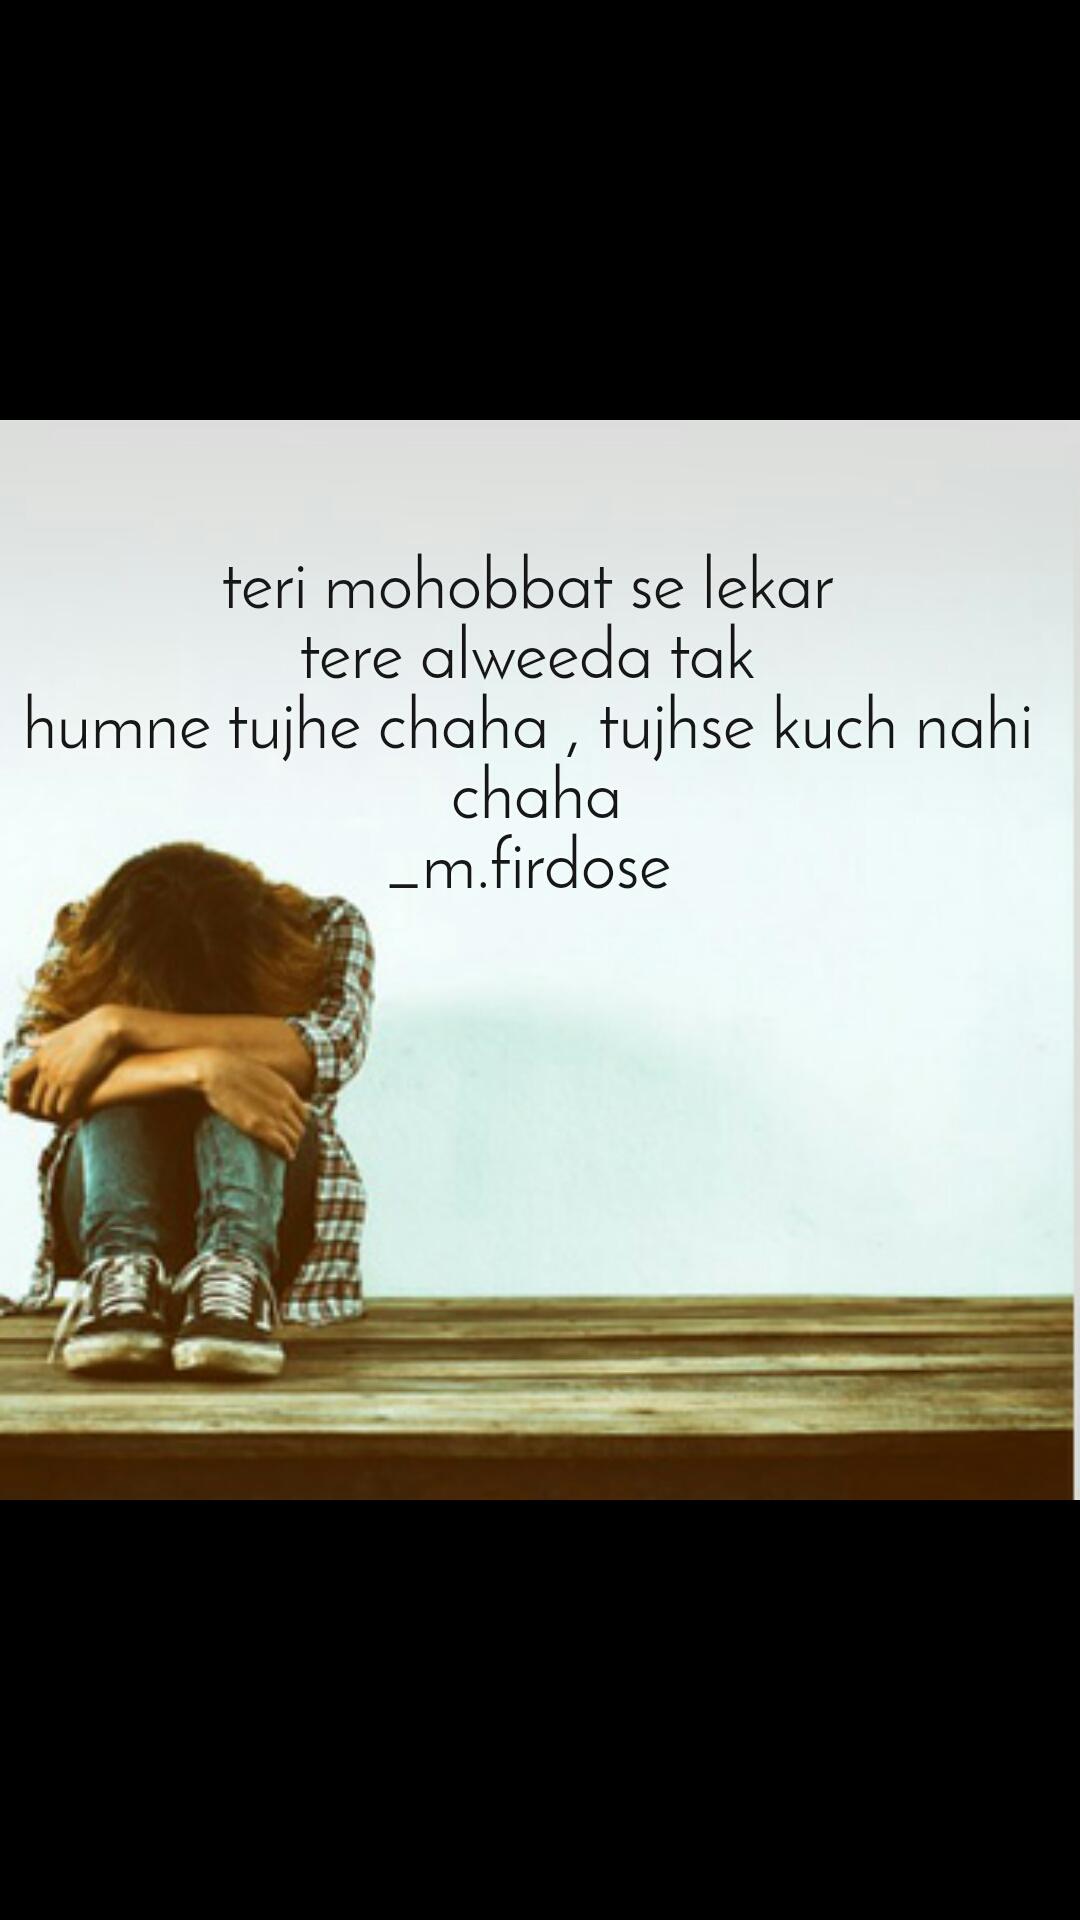 Sad quotes in hindi teri mohobbat se lekar  tere alweeda tak  humne tujhe chaha , tujhse kuch nahi  chaha _m.firdose